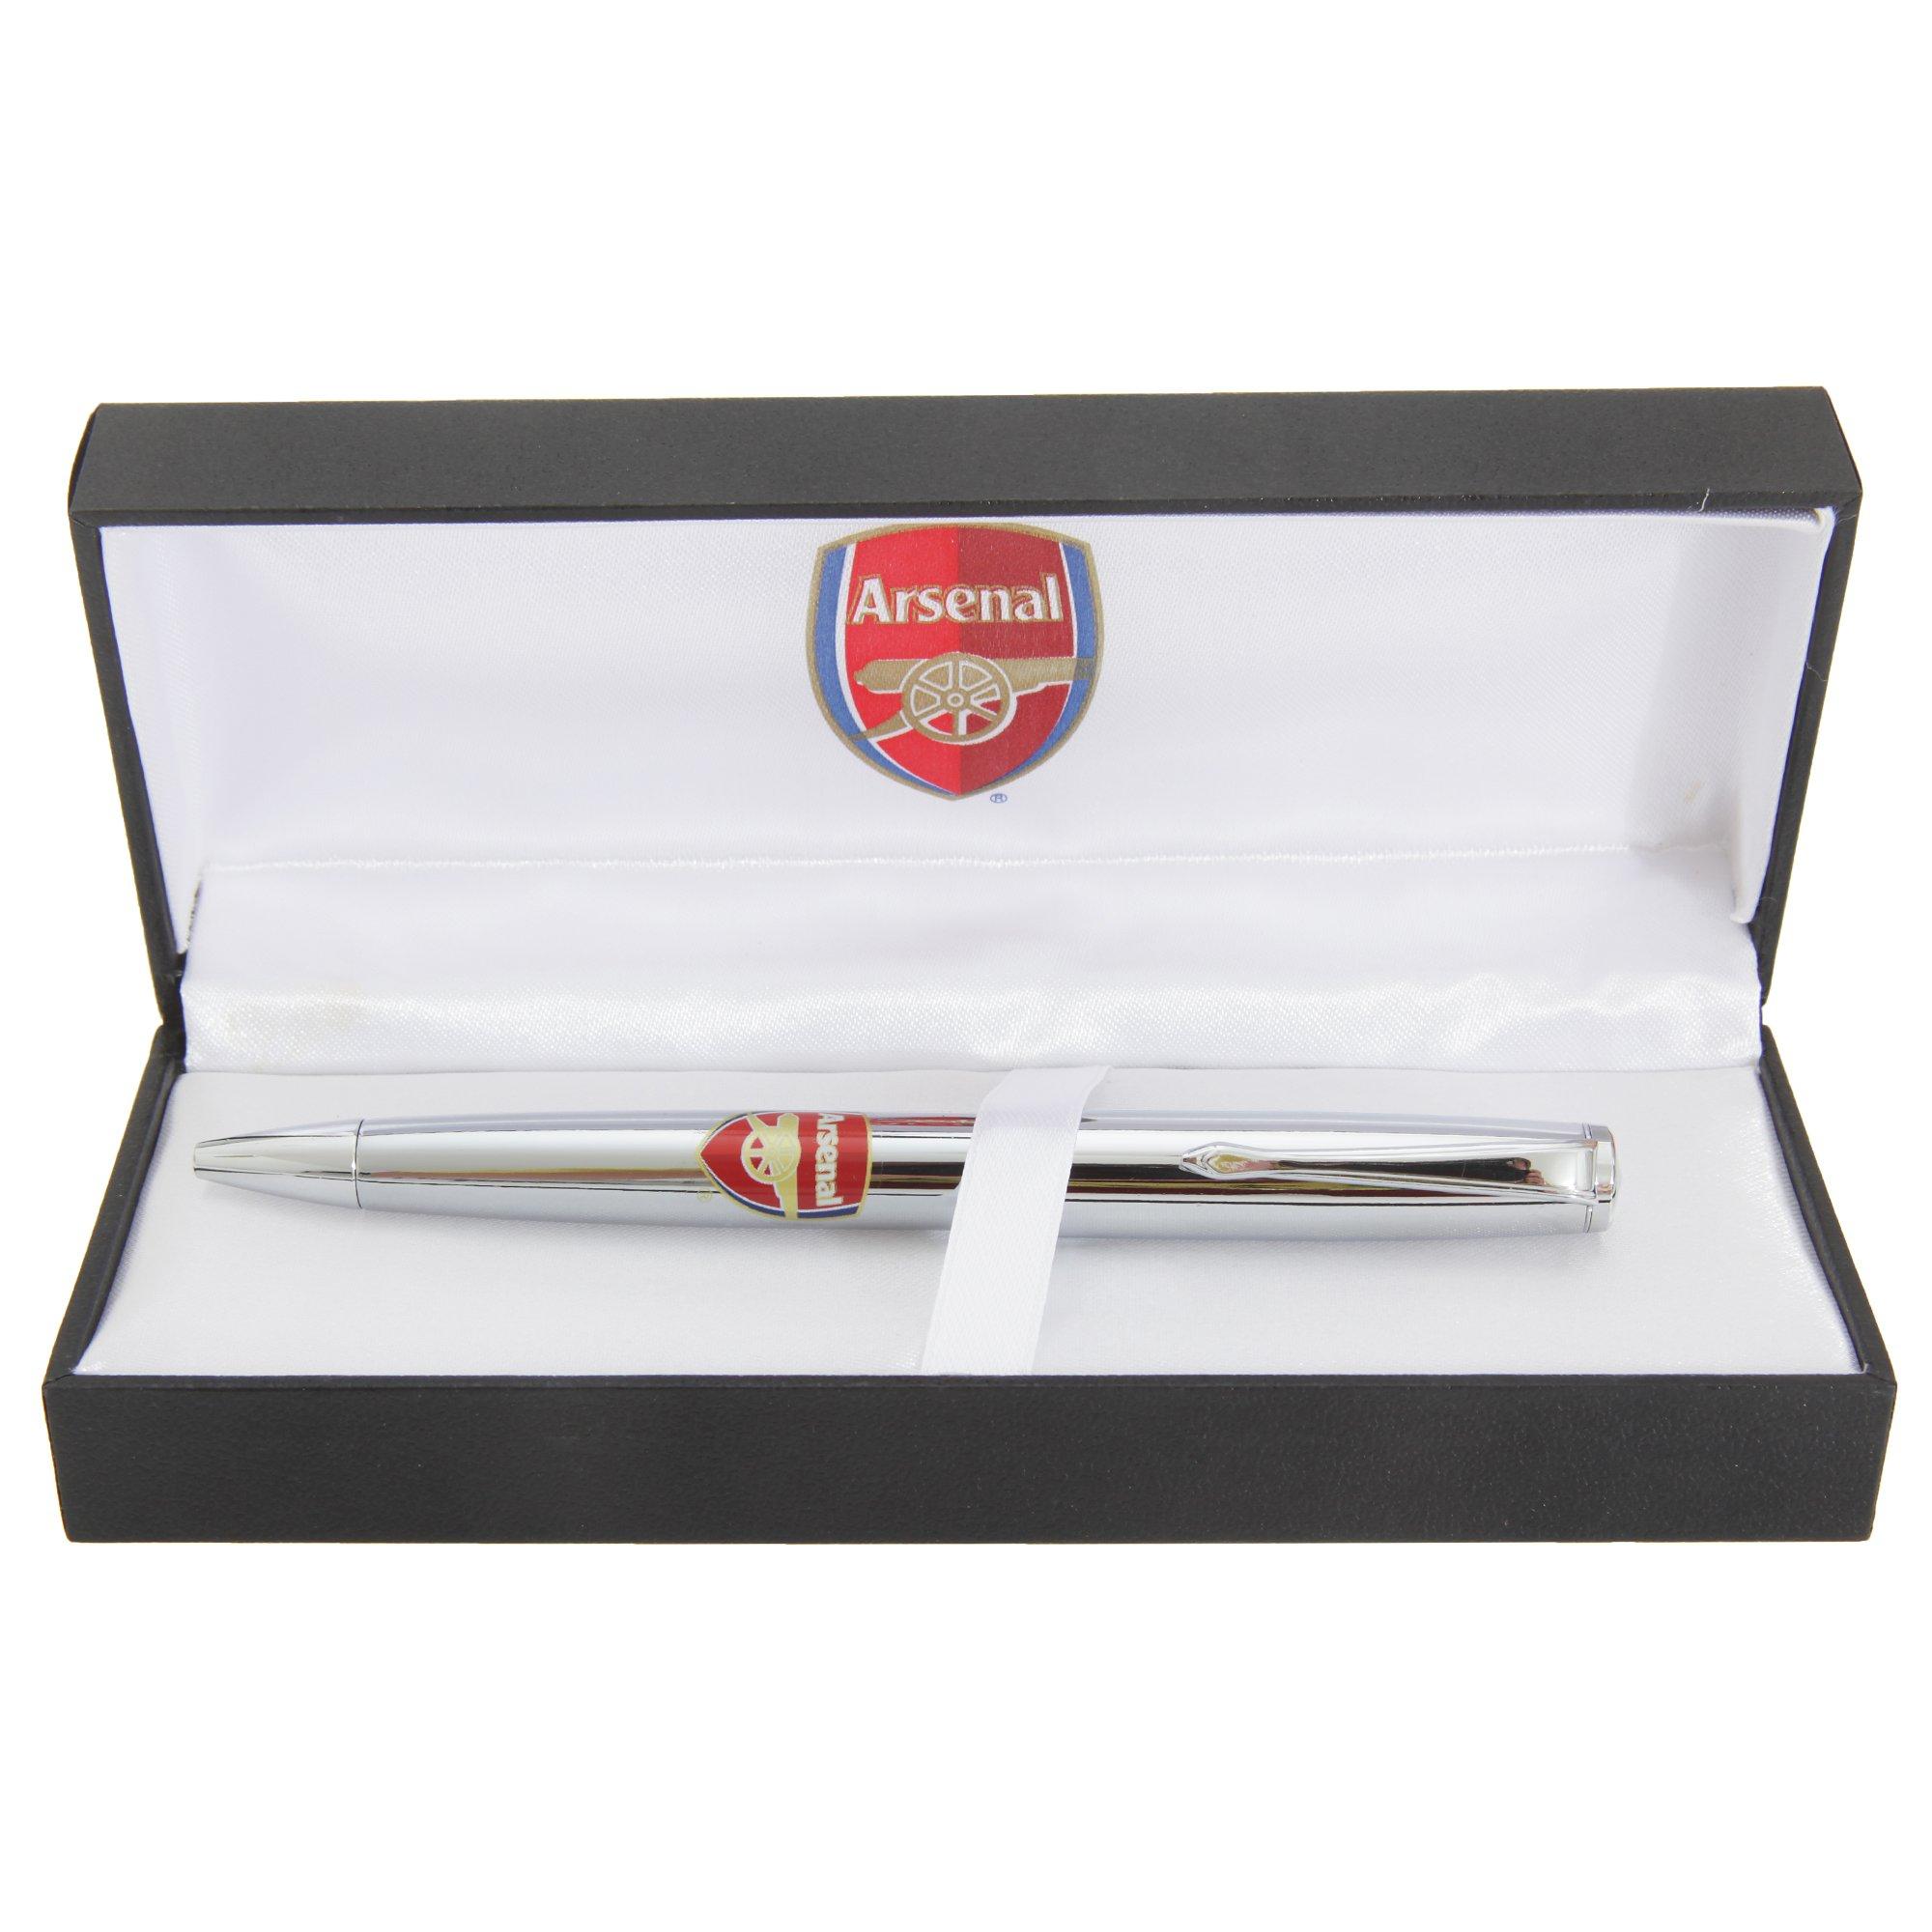 Arsenal FC Official Chrome Football Crest Ball Point Pen